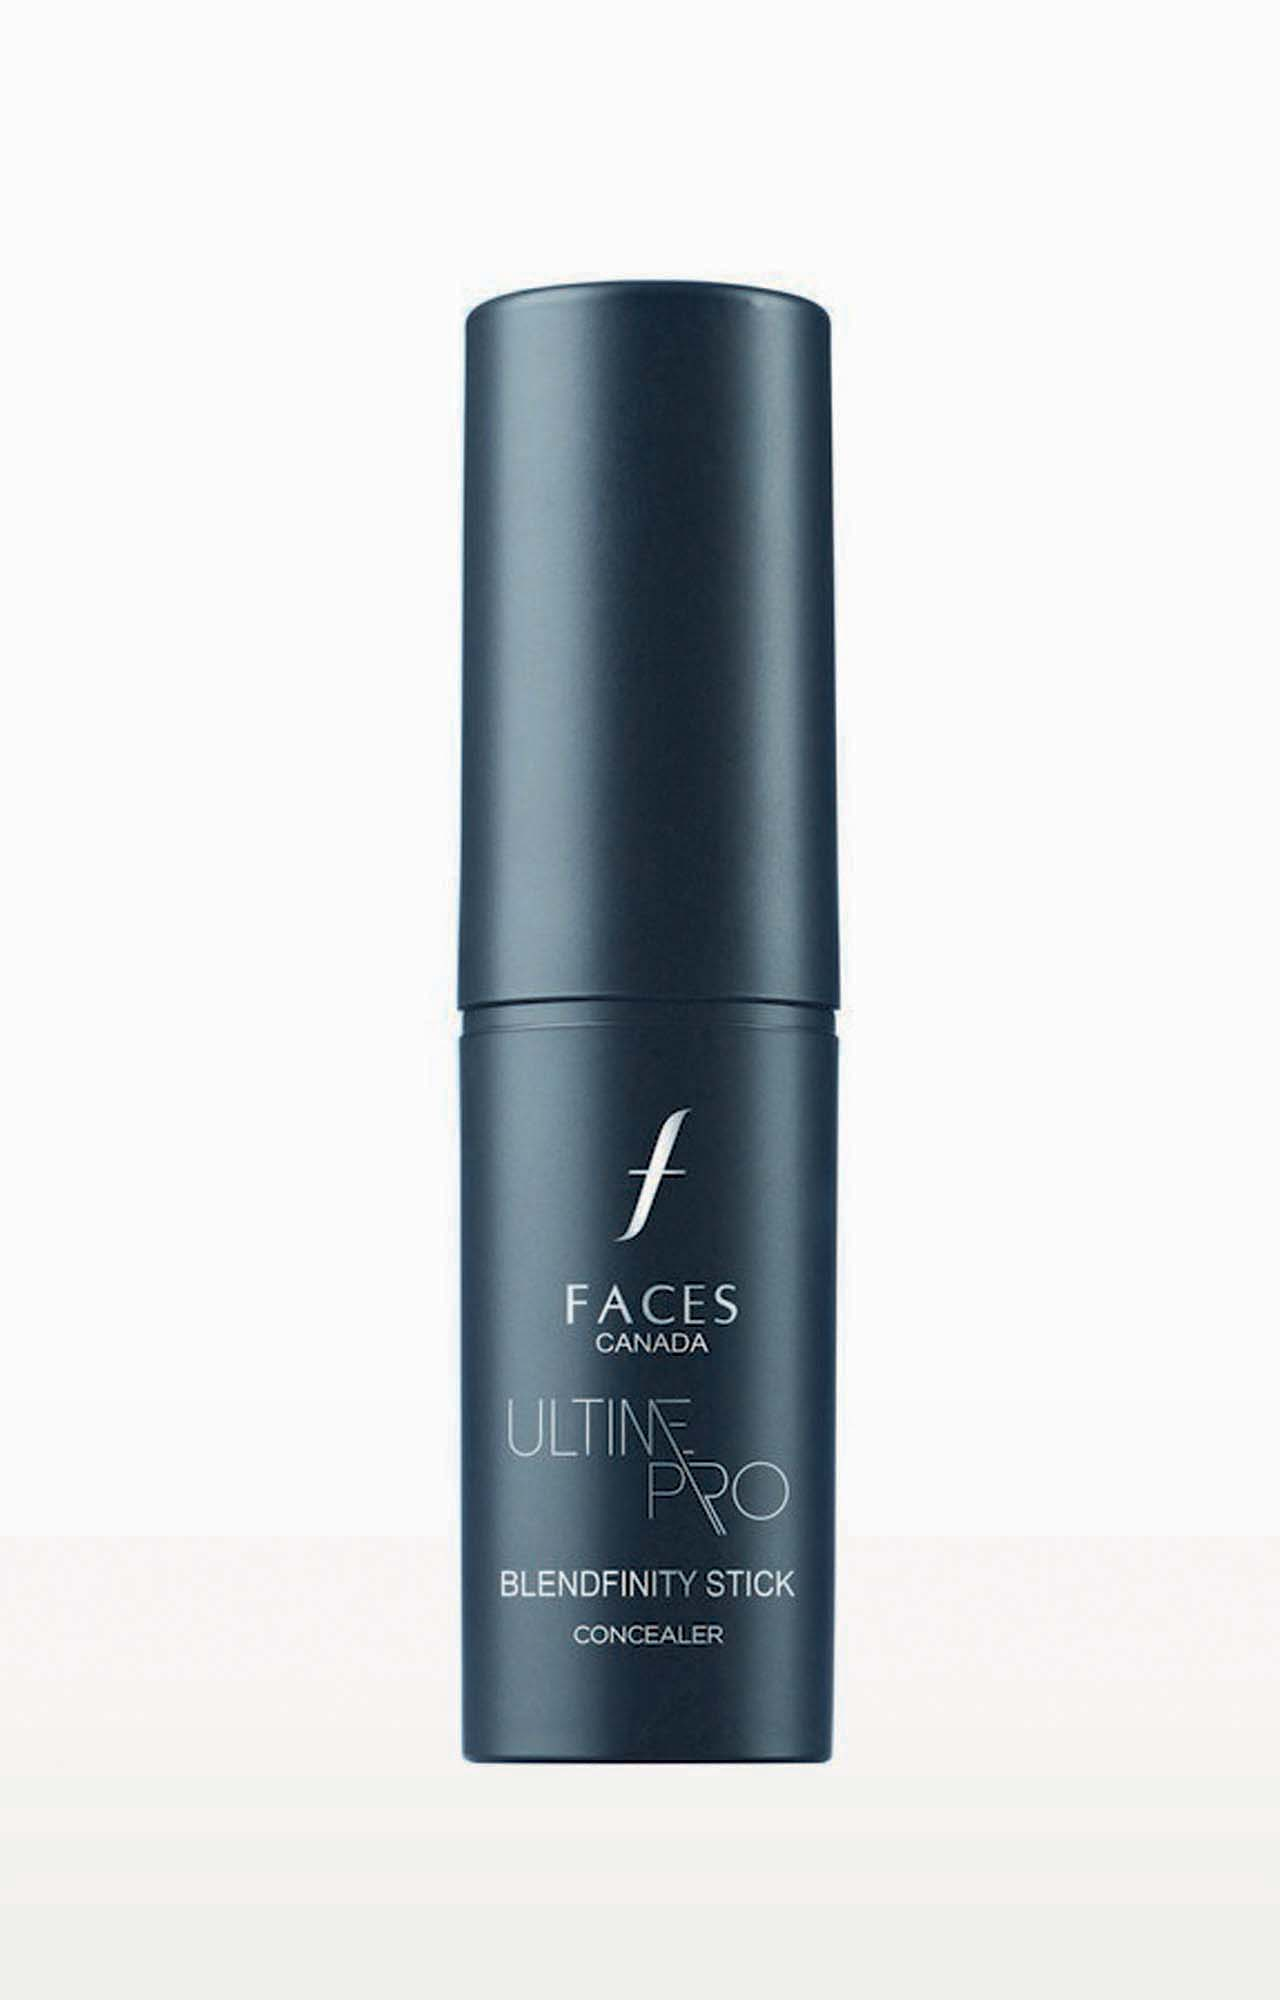 Faces Canada | Ultime Pro Blend Finity Stick - Light 01